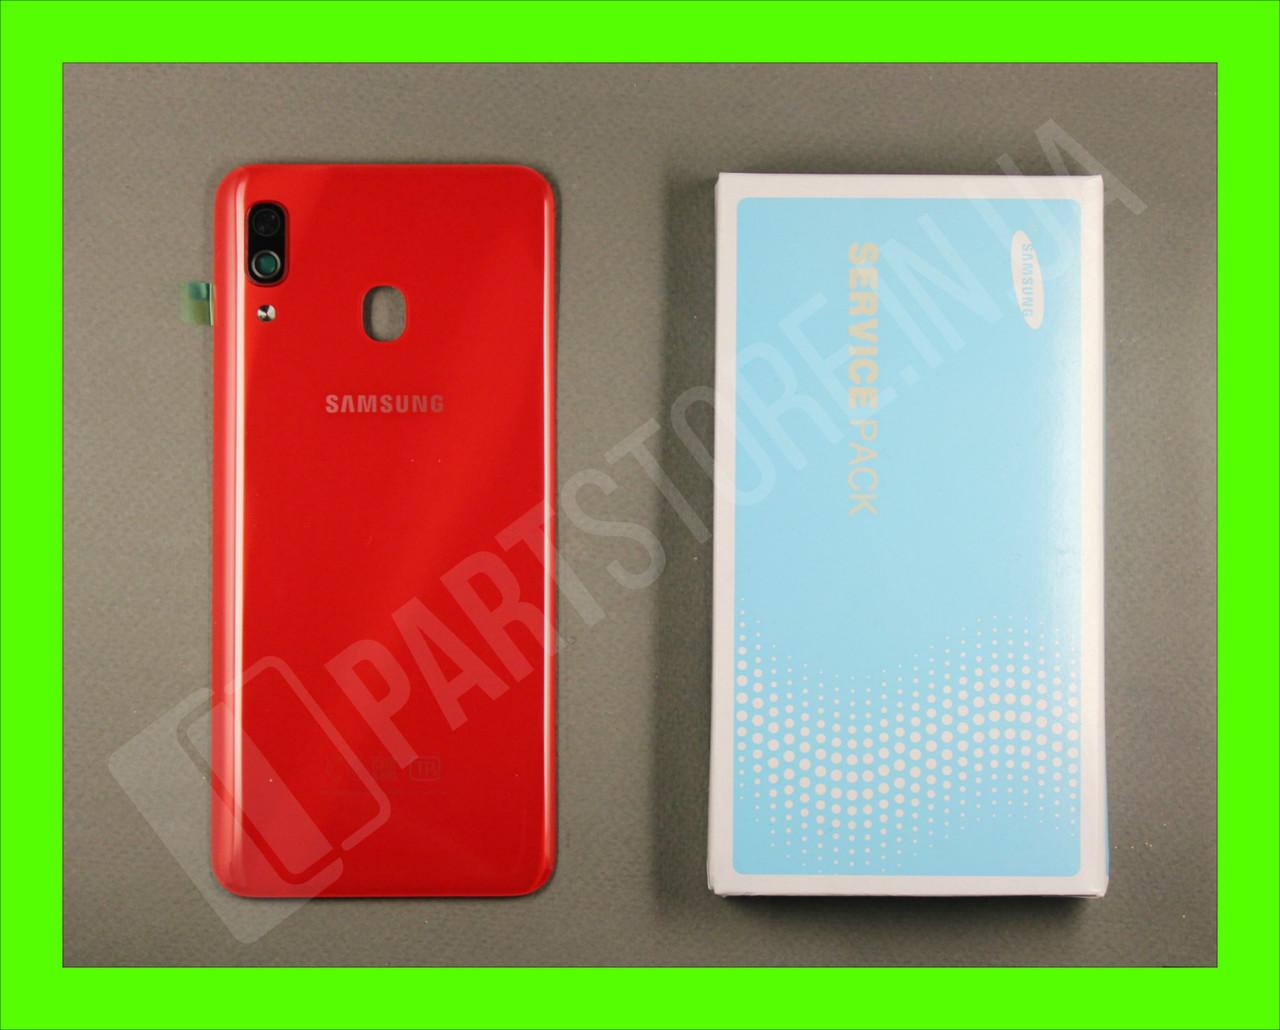 Cервисная оригинальная задняя Крышка Samsung A305 Red A30 2019 (GH82-19255D)